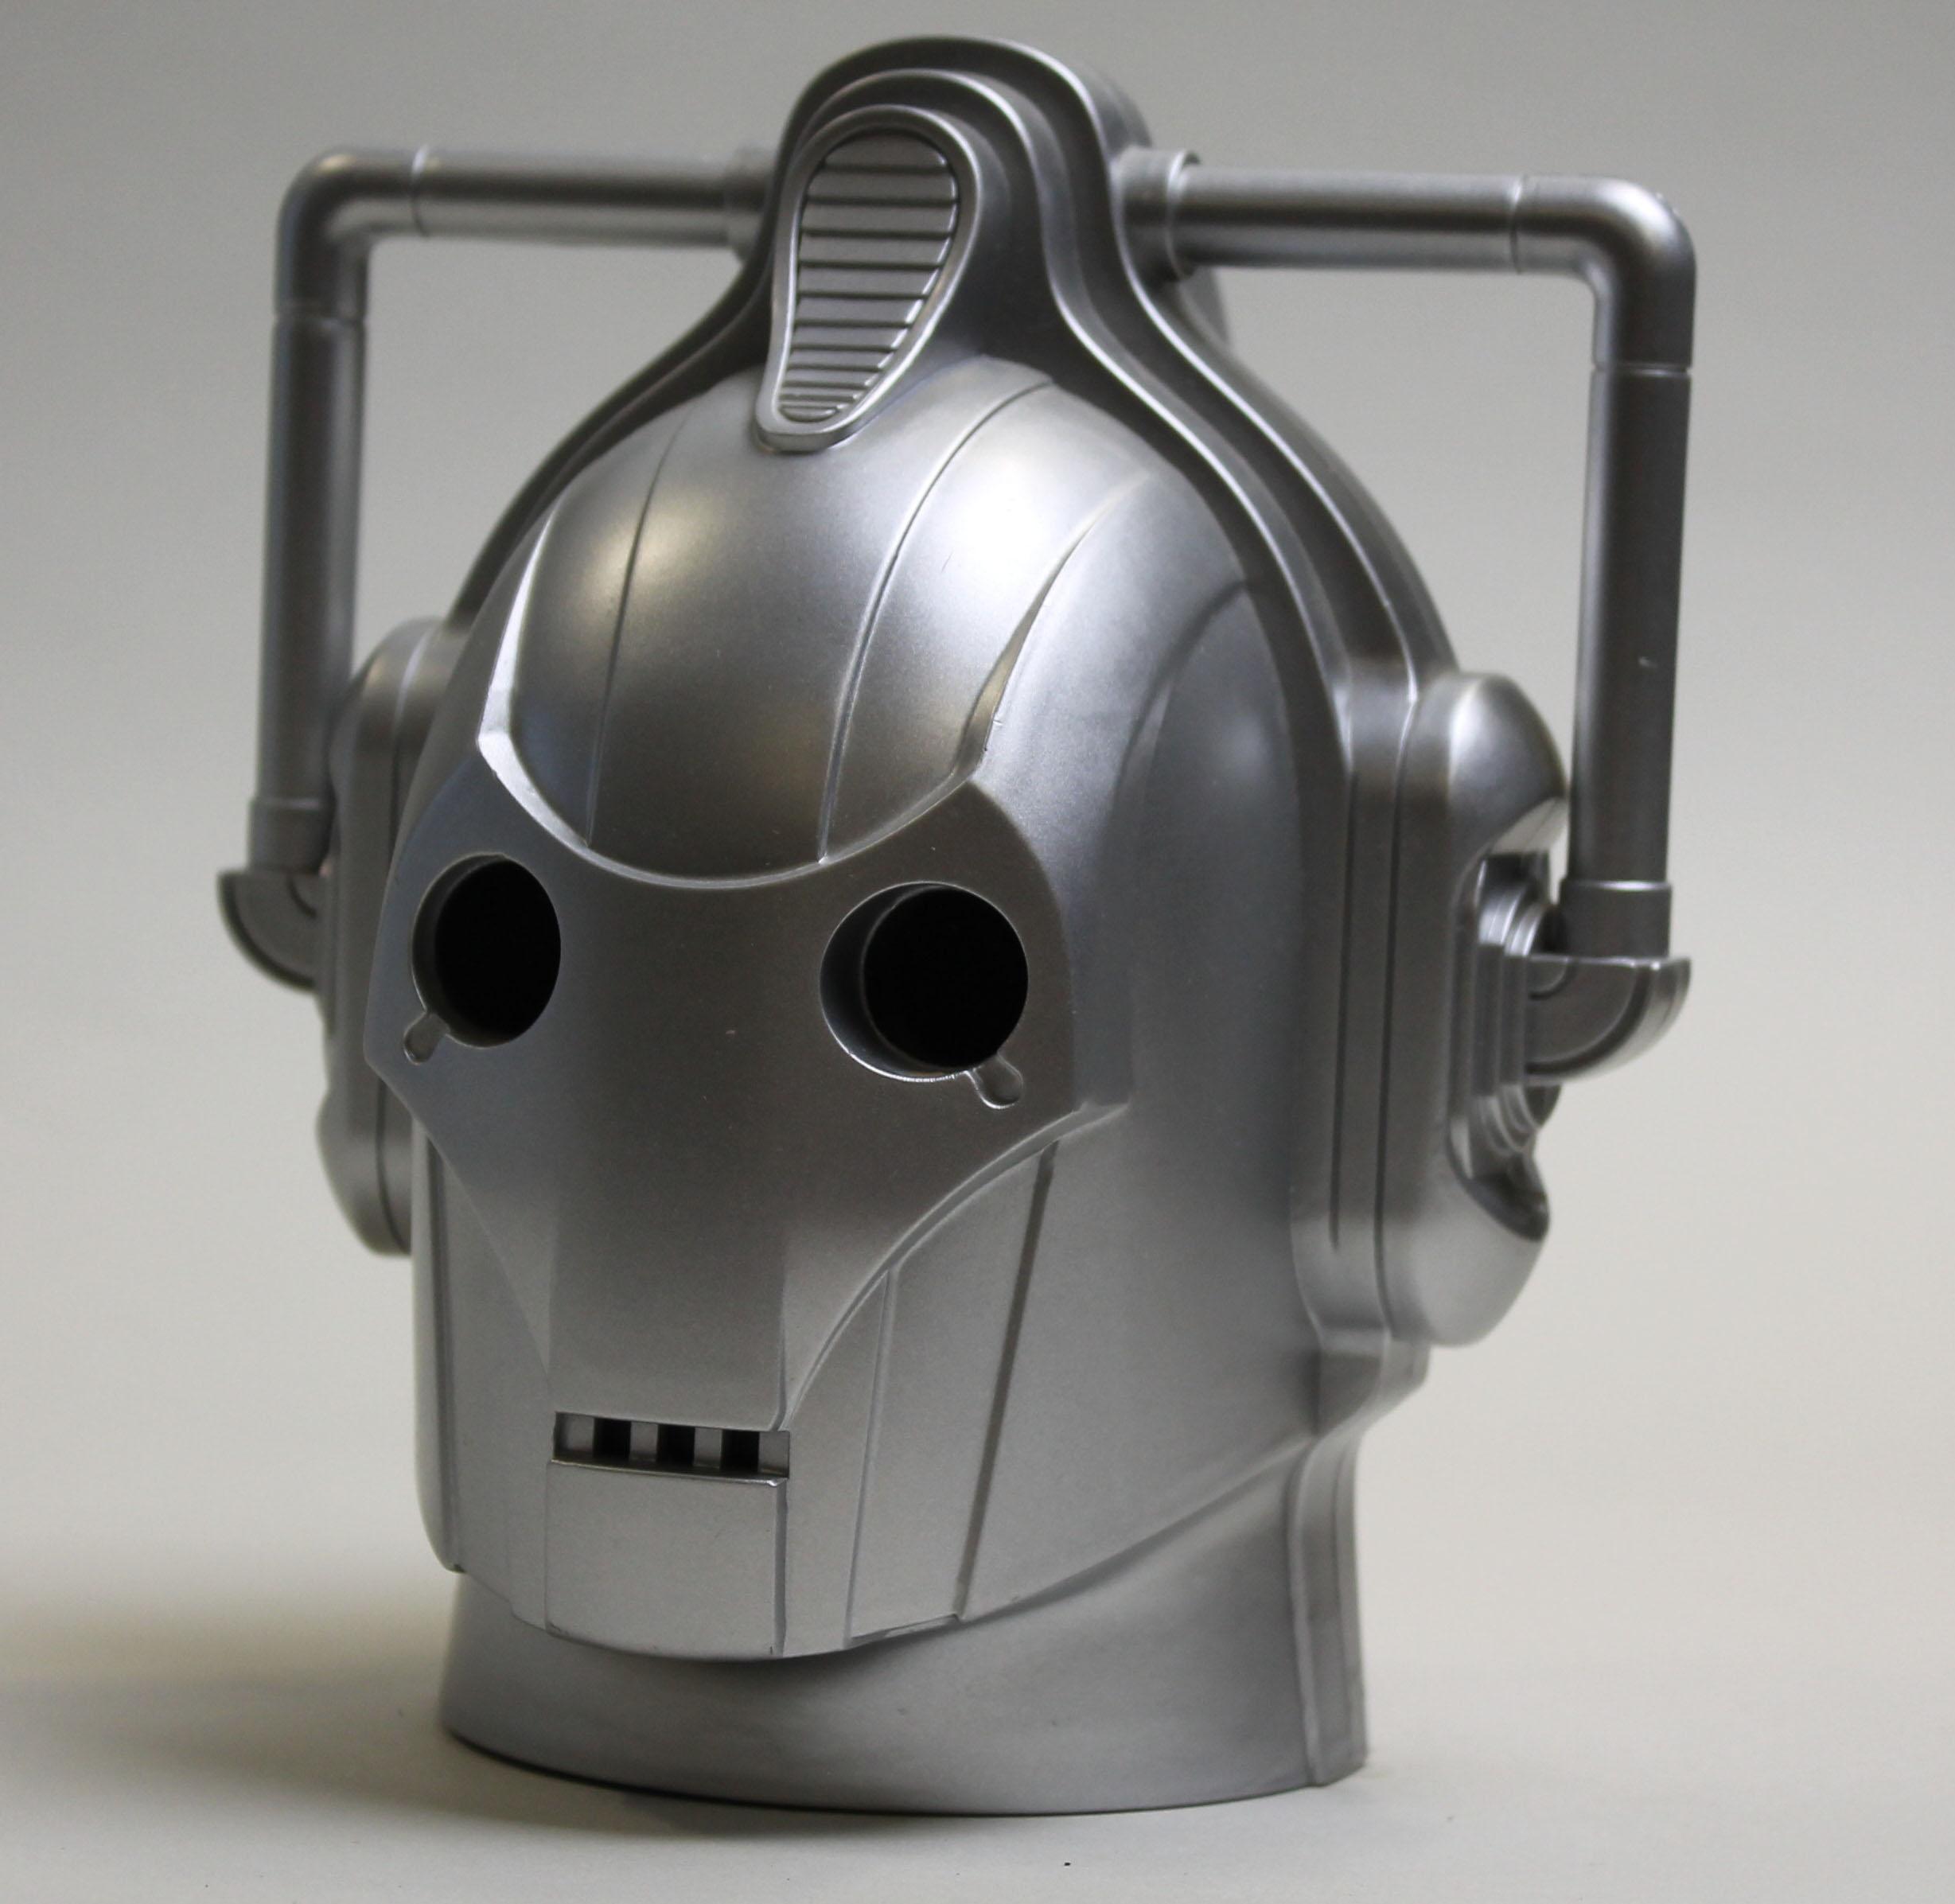 Cyberman Toy